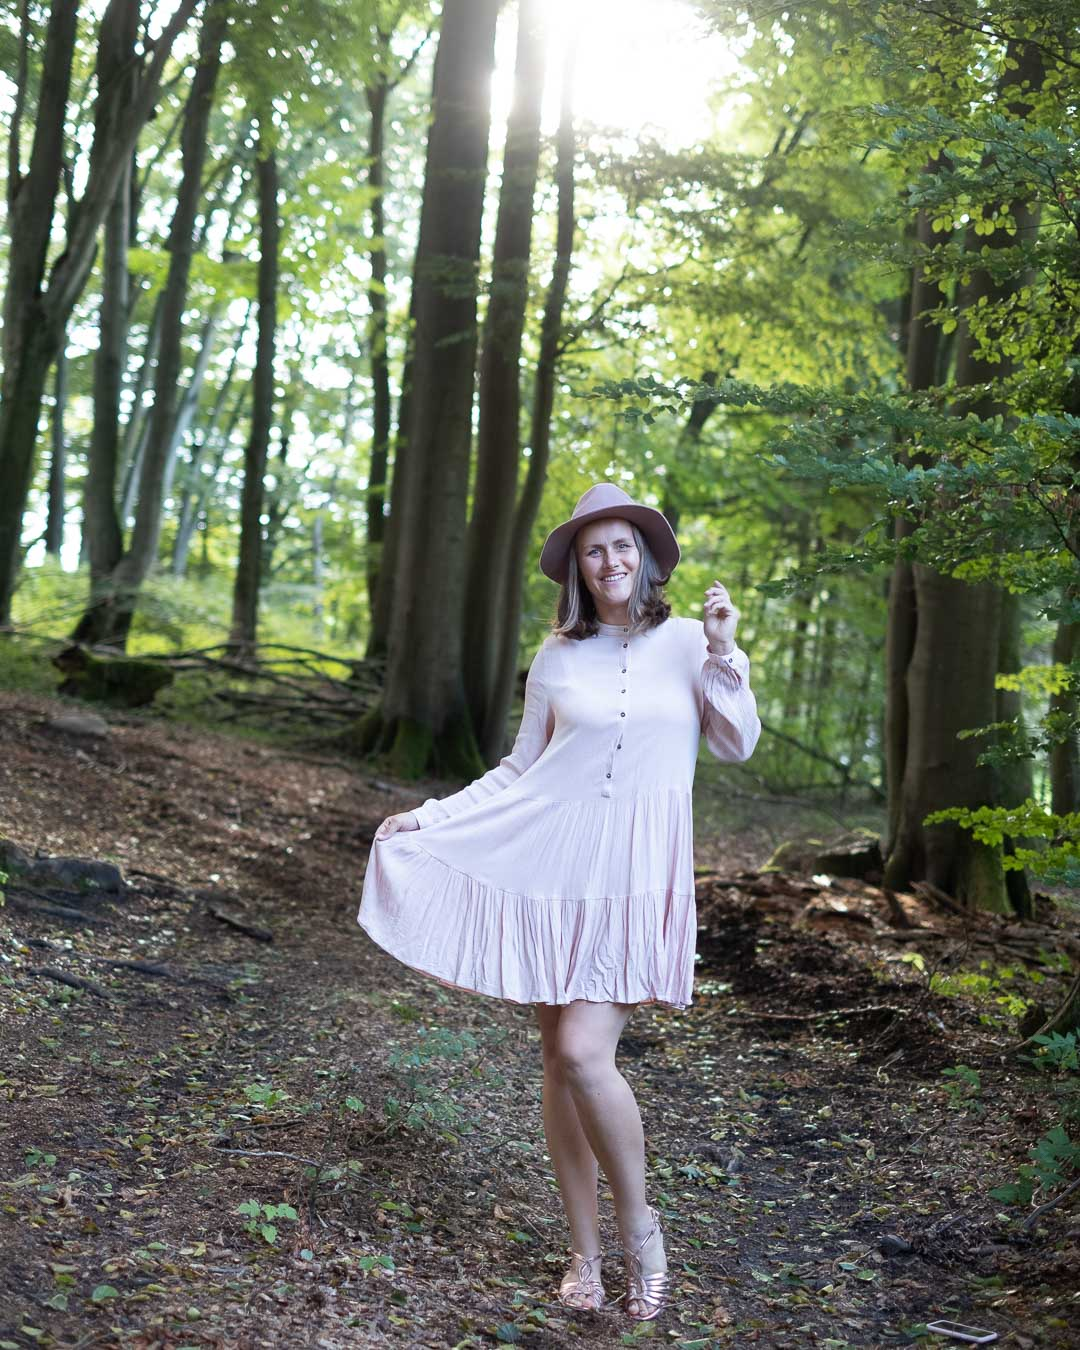 Mädchenhafte Fotoidee im Wald